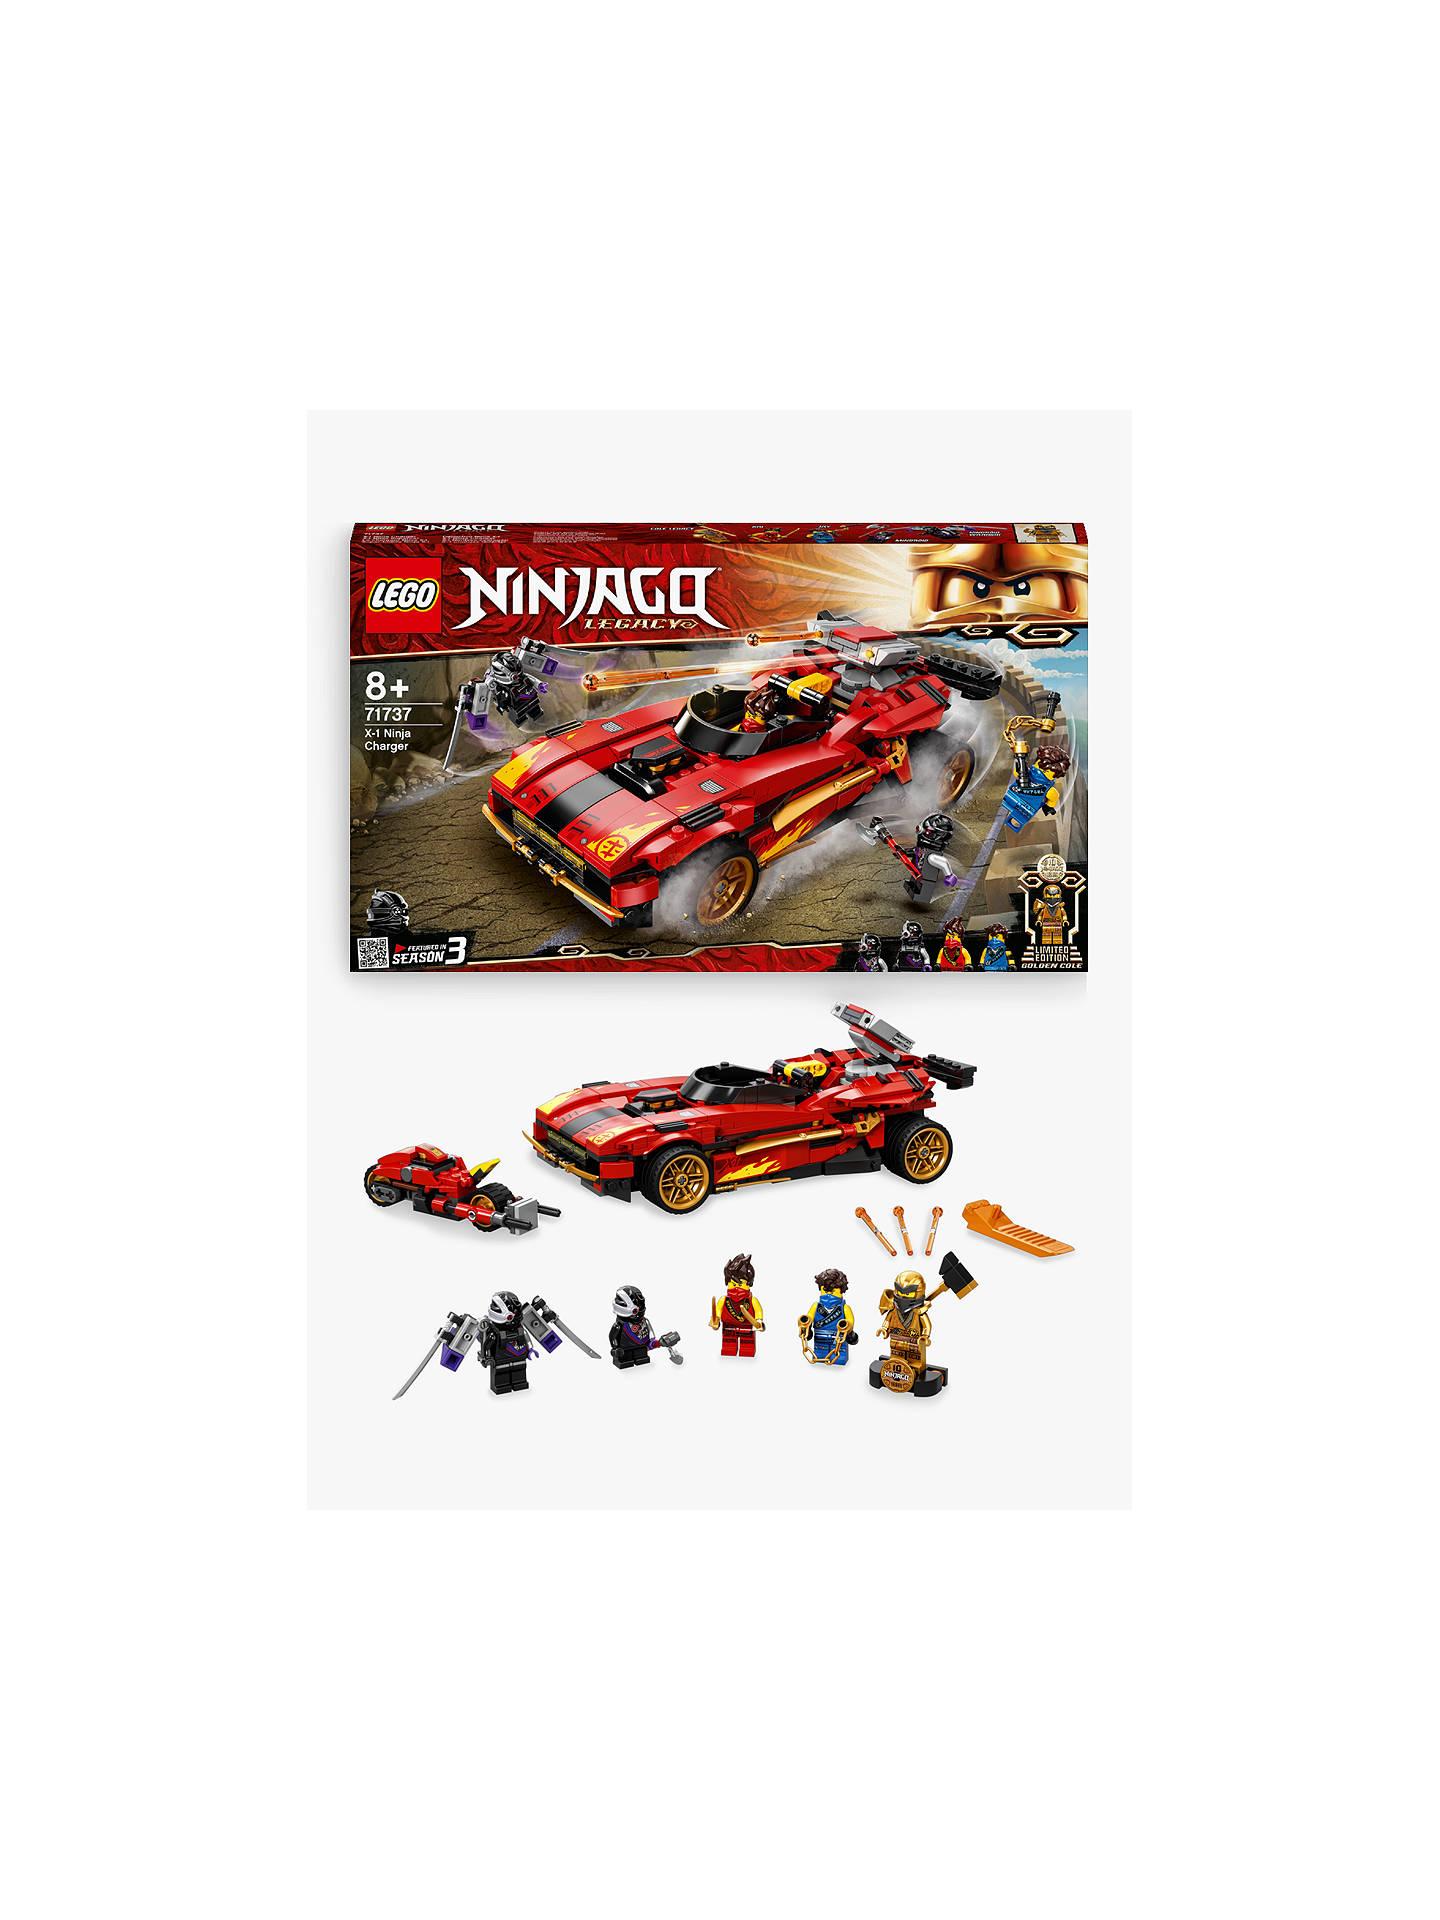 LEGO Ninjago 71737 X-1 Ninja Charger at John Lewis & Partners